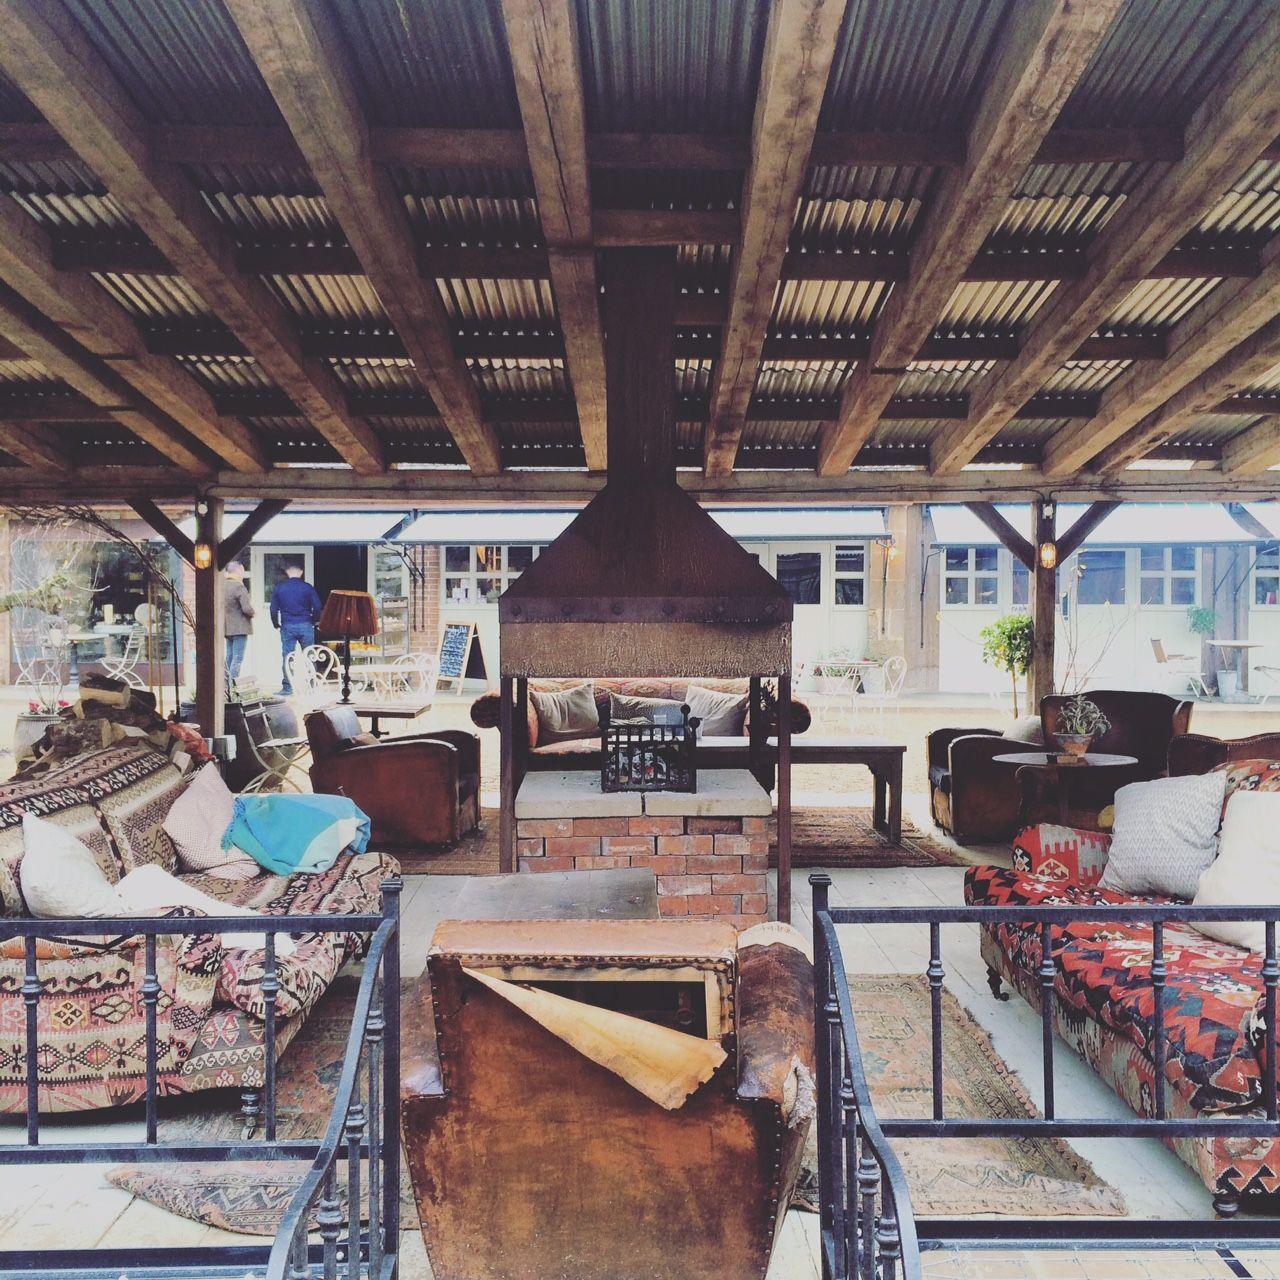 soho farmhouse, great tew, oxfordshire - outdoor seating areas